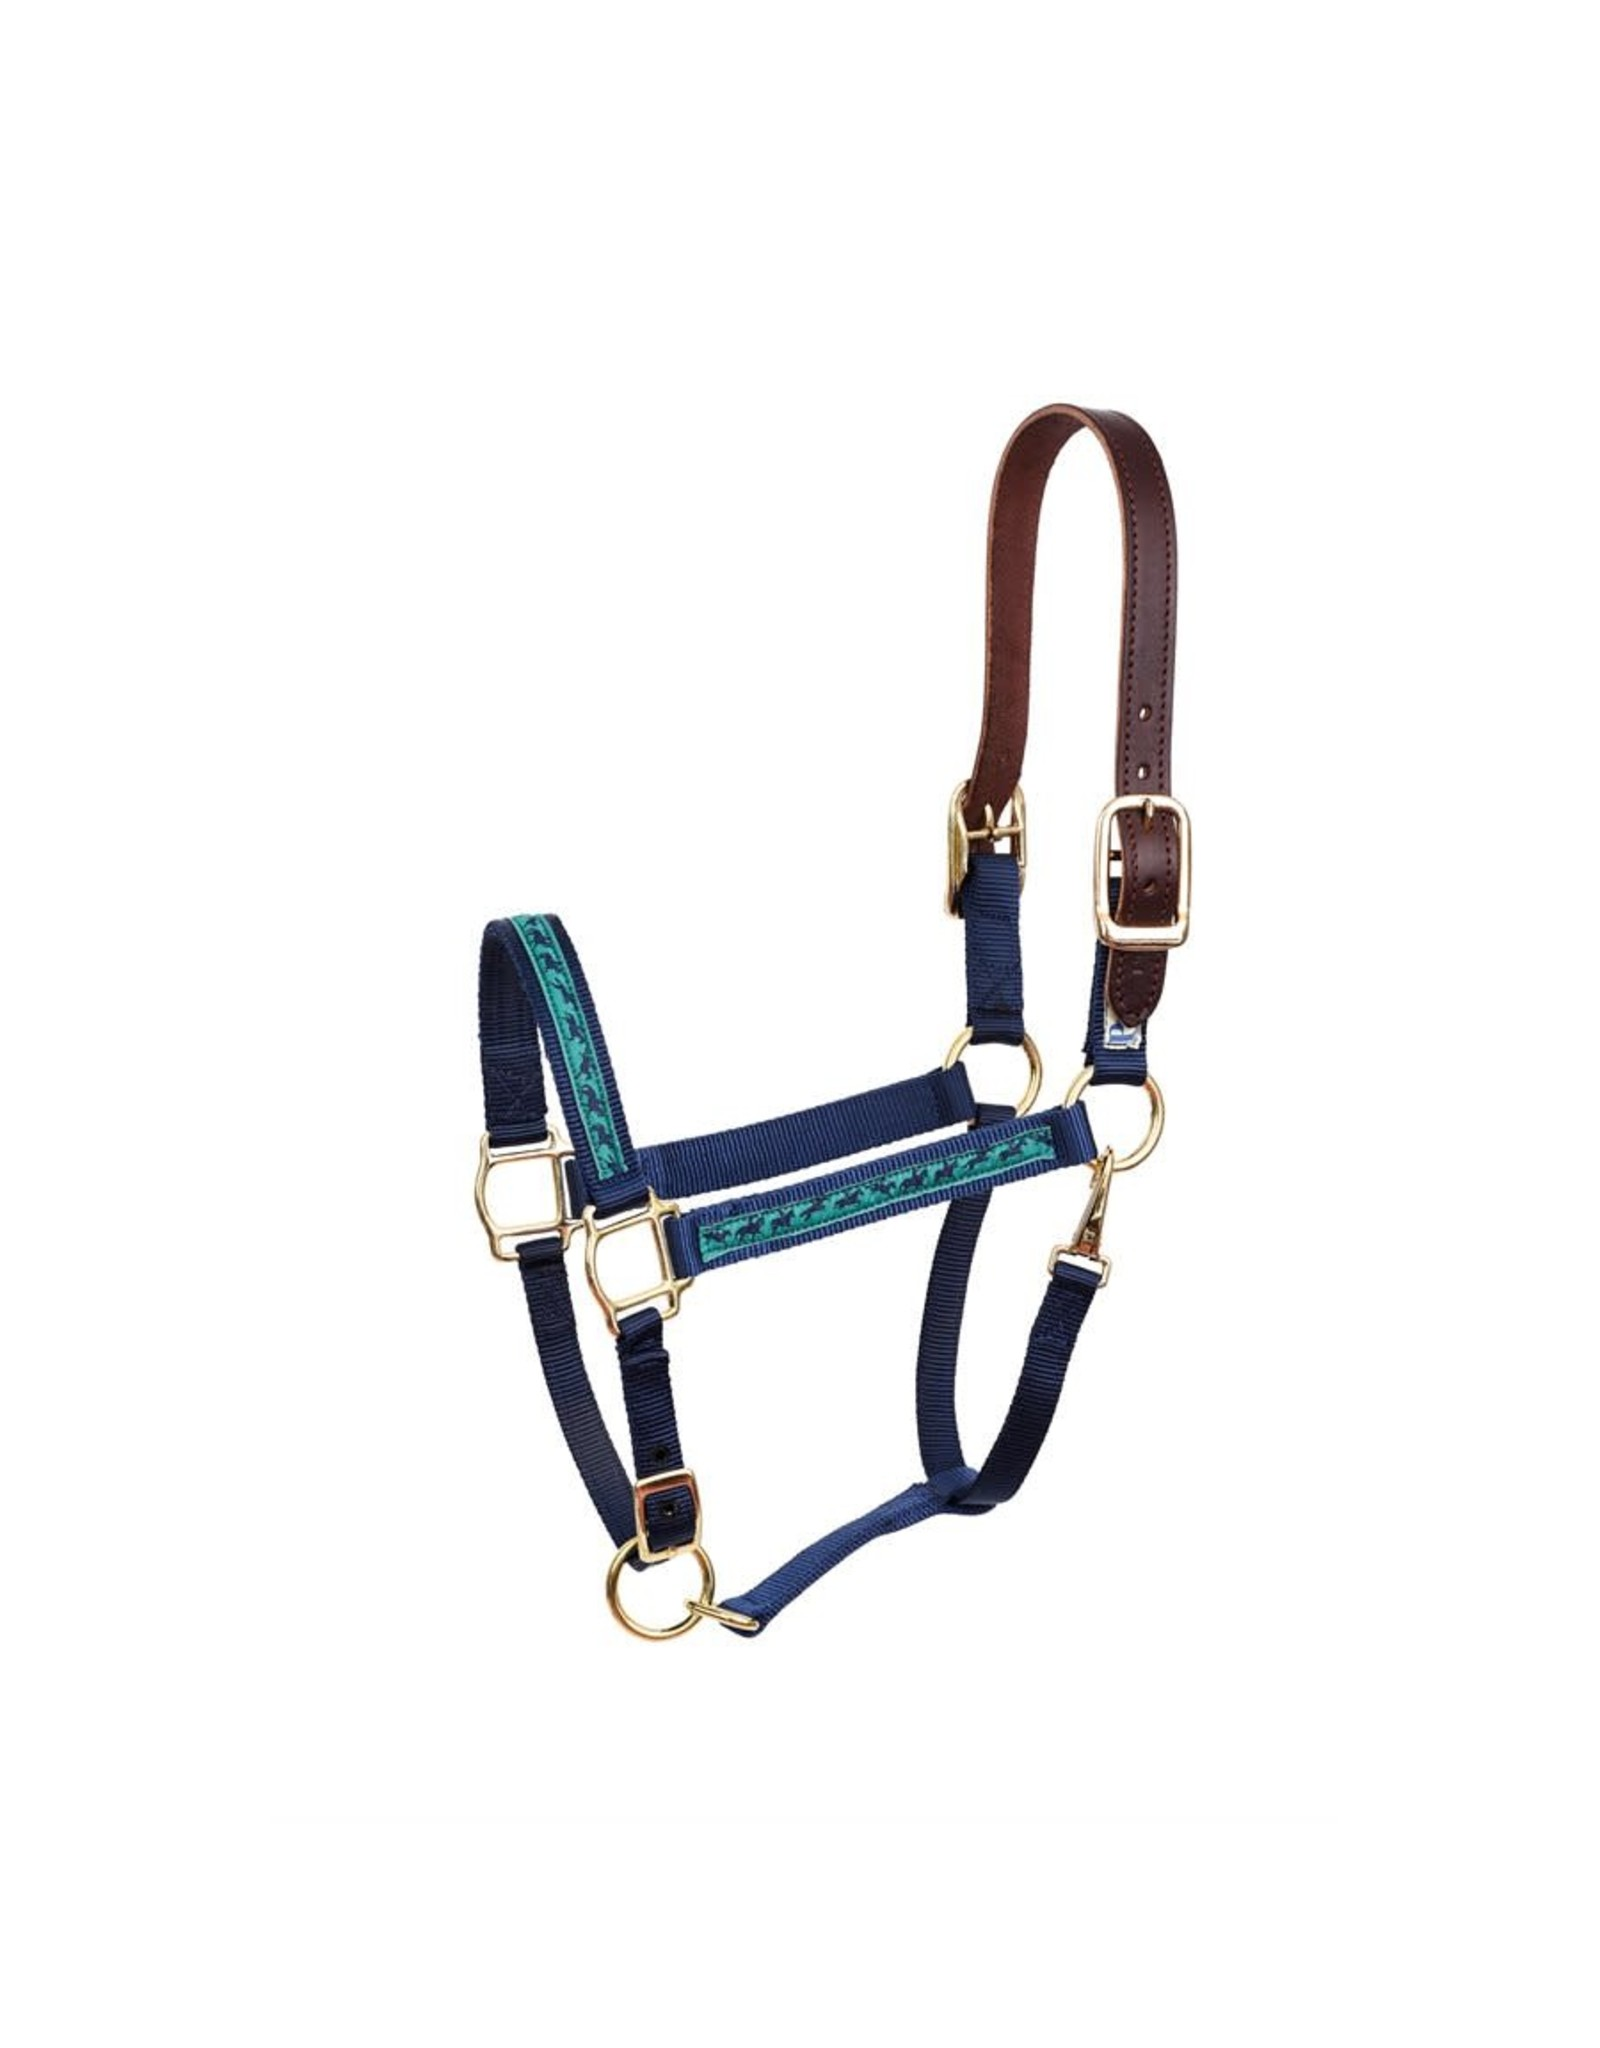 Perri's Halter Safety Navy Jumping Horses